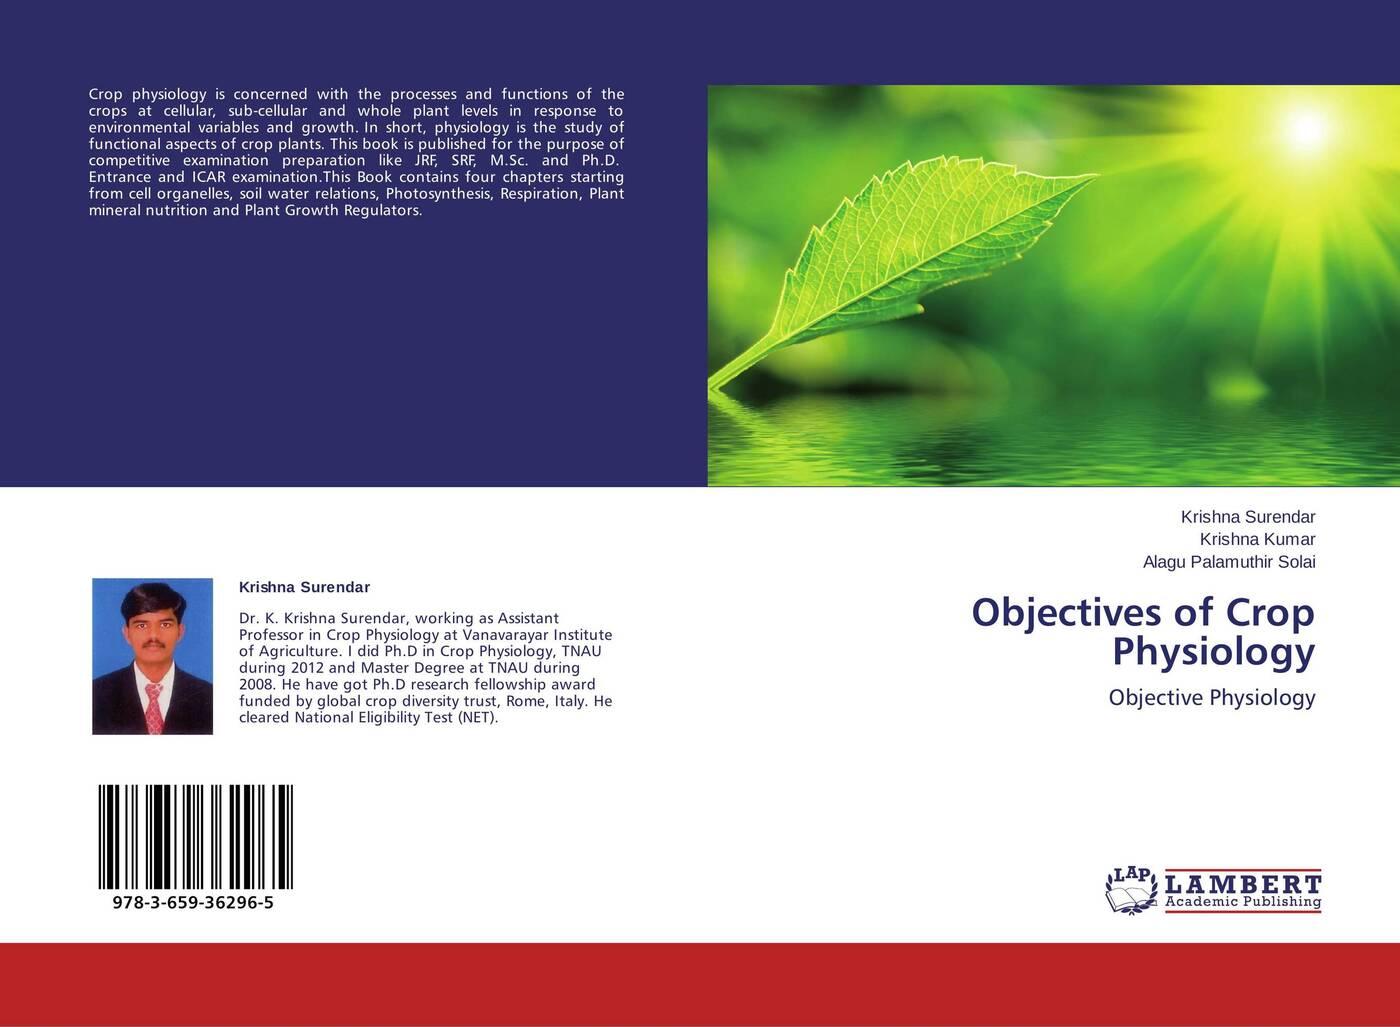 Krishna Surendar,Krishna Kumar and Alagu Palamuthir Solai Objectives of Crop Physiology preparation crop tee